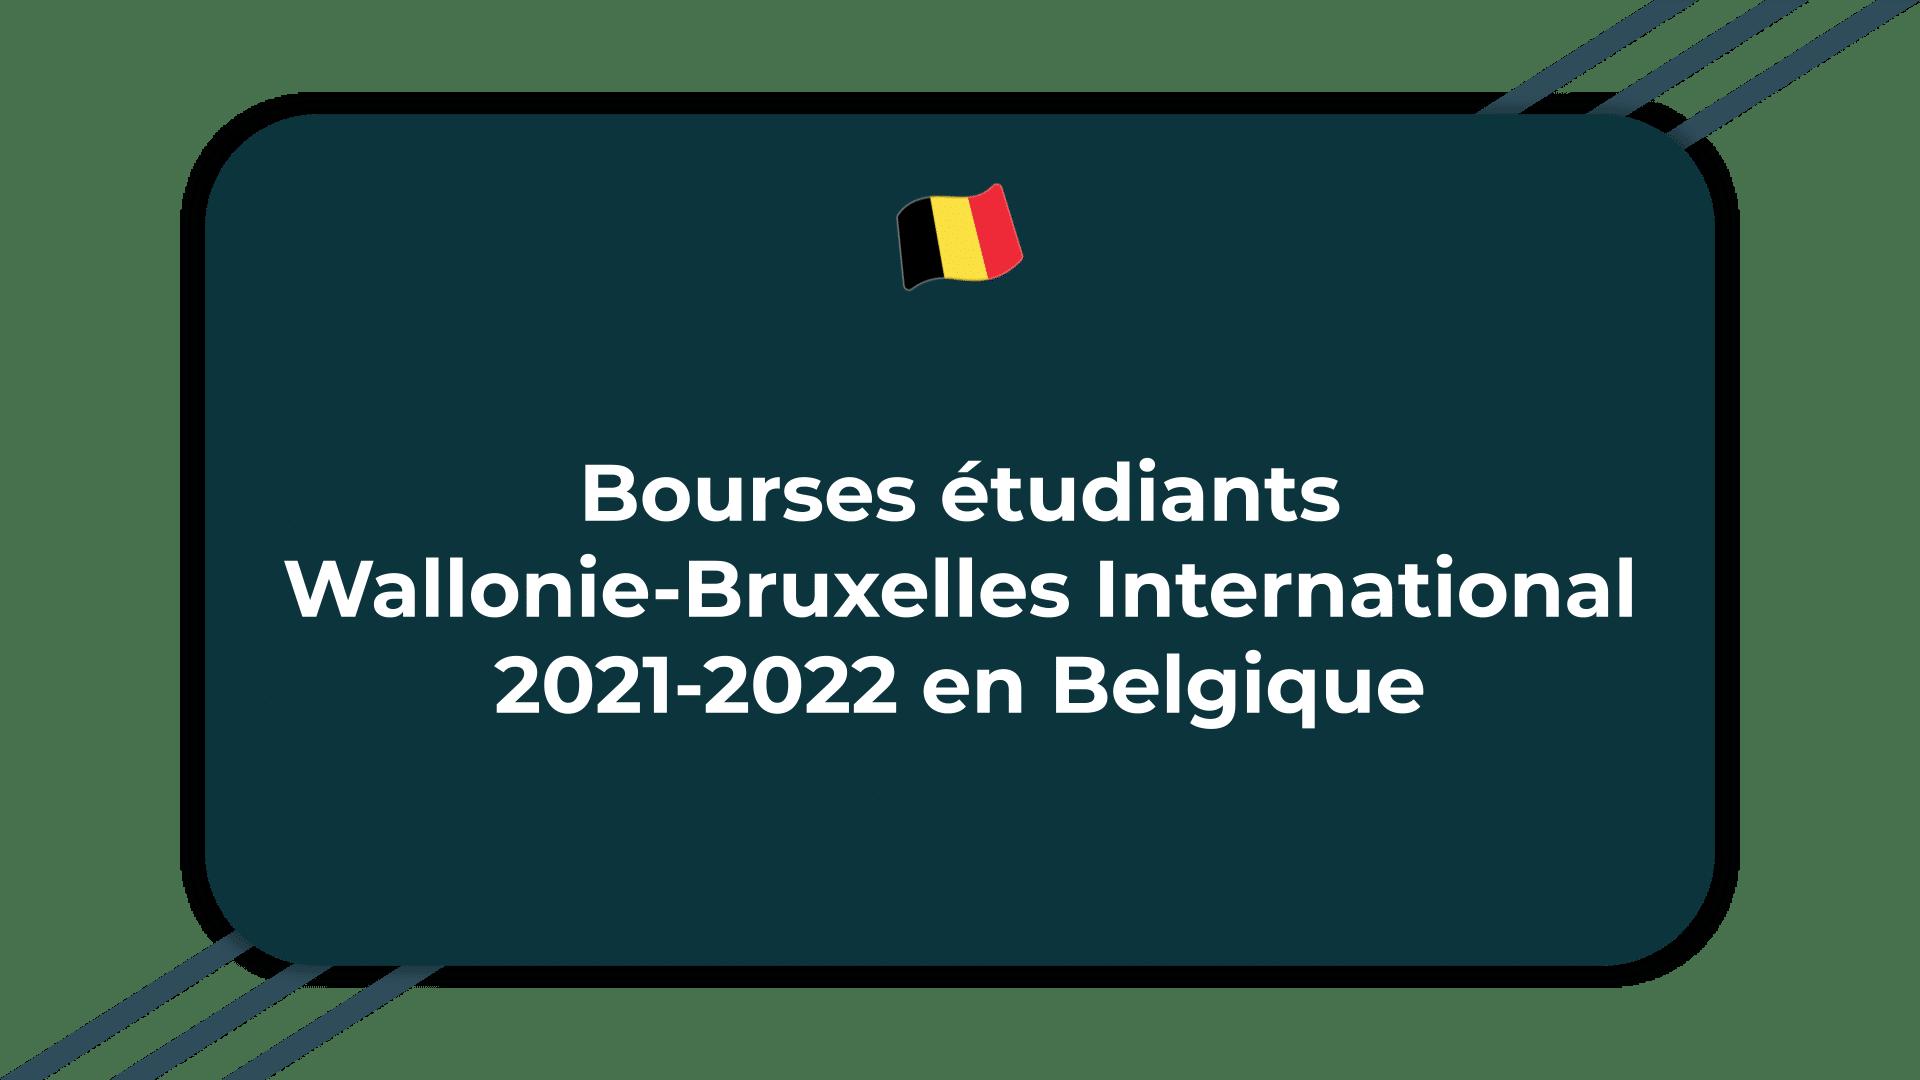 Bourses étudiants Wallonie-Bruxelles International